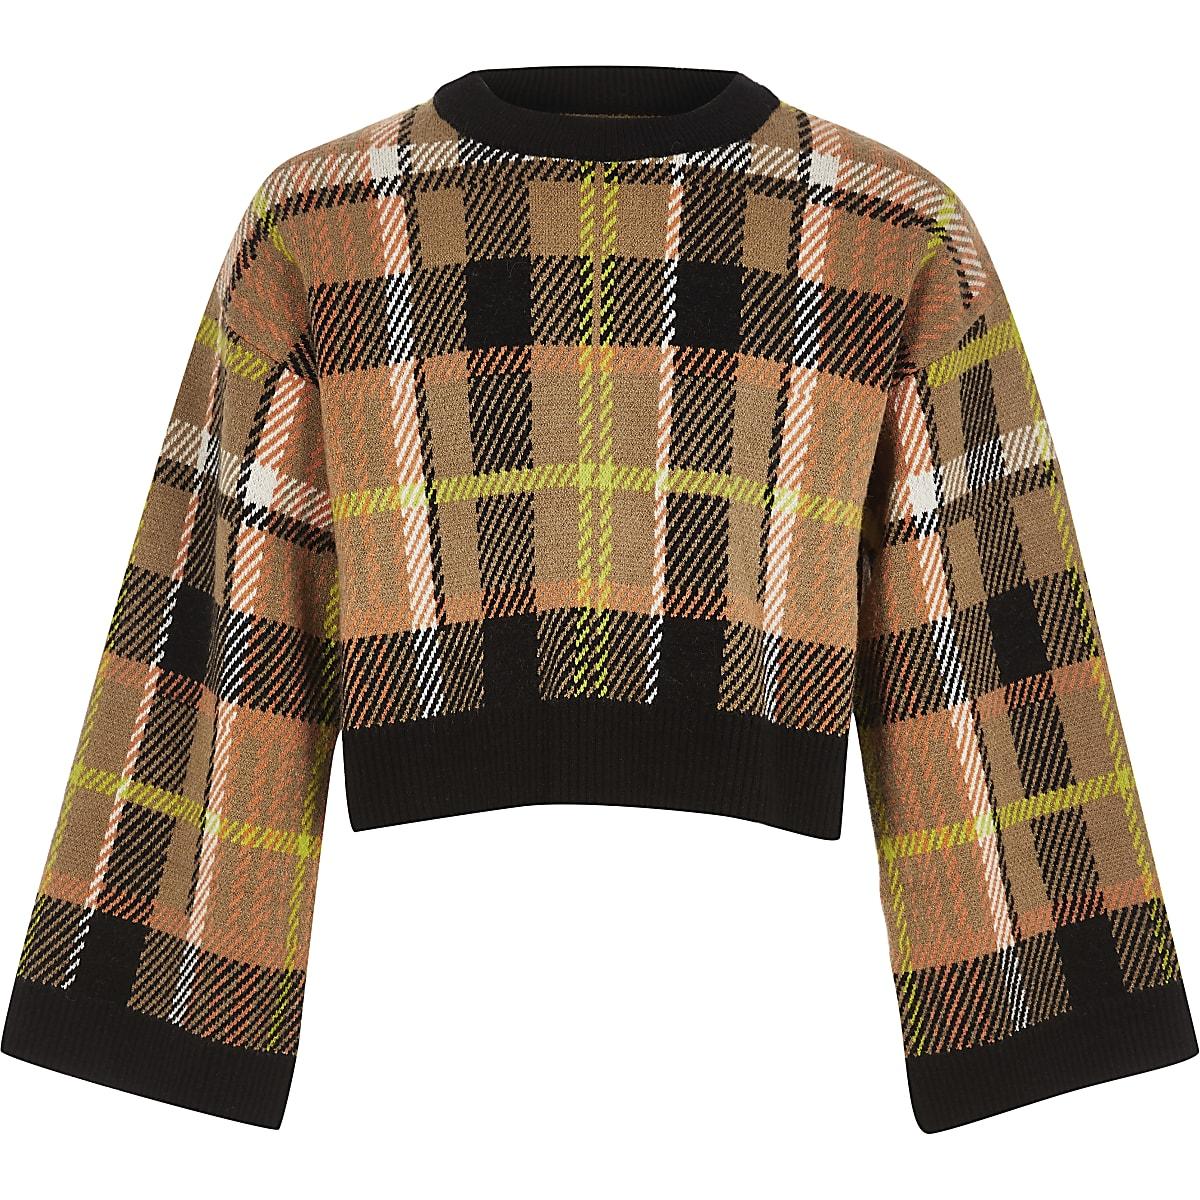 Bruine geruite gebreide cropped pullover voor meisjes